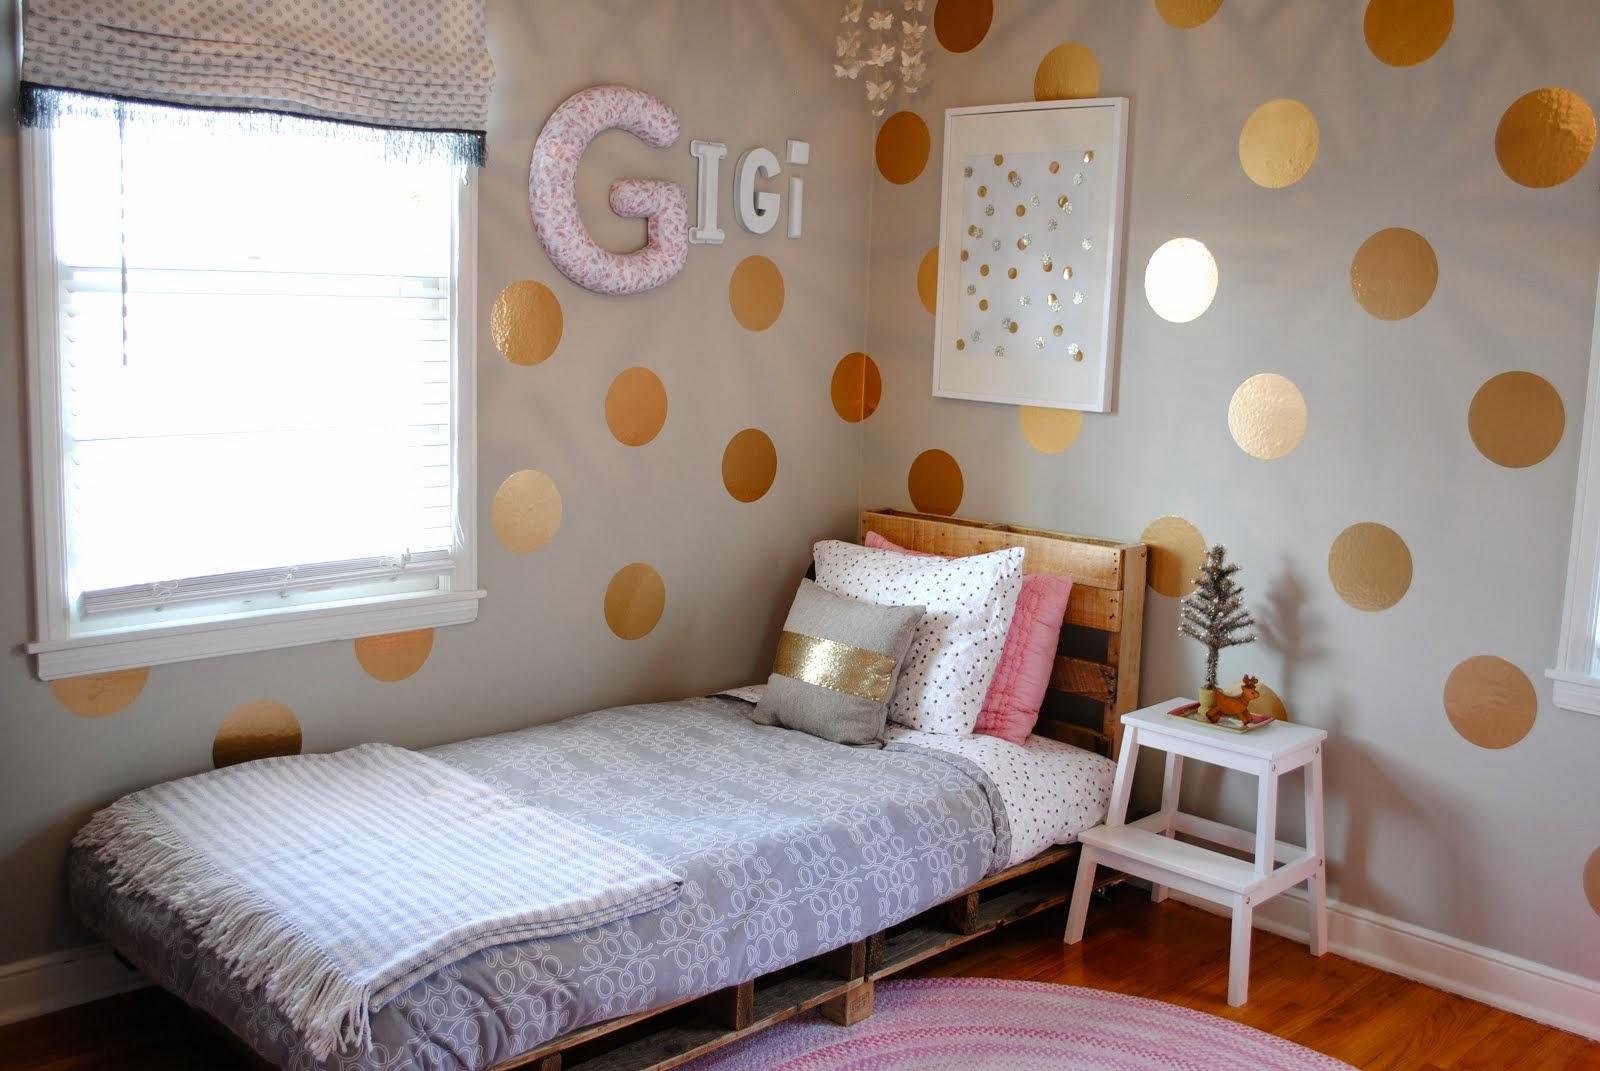 Gigi's Room